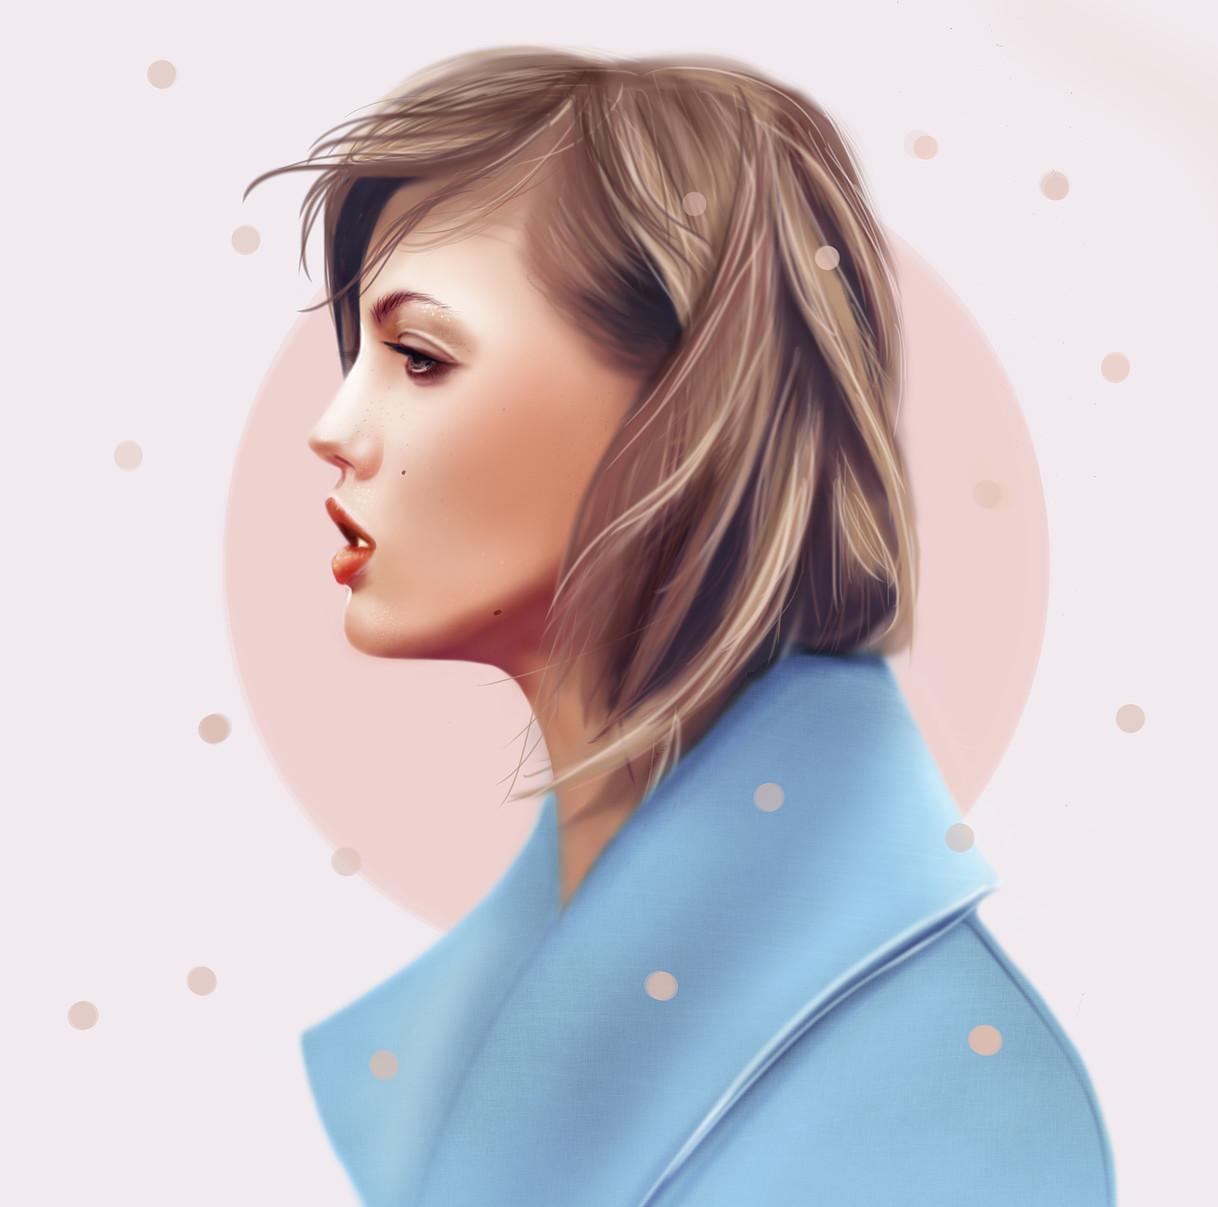 Lisa King Digital Art 02